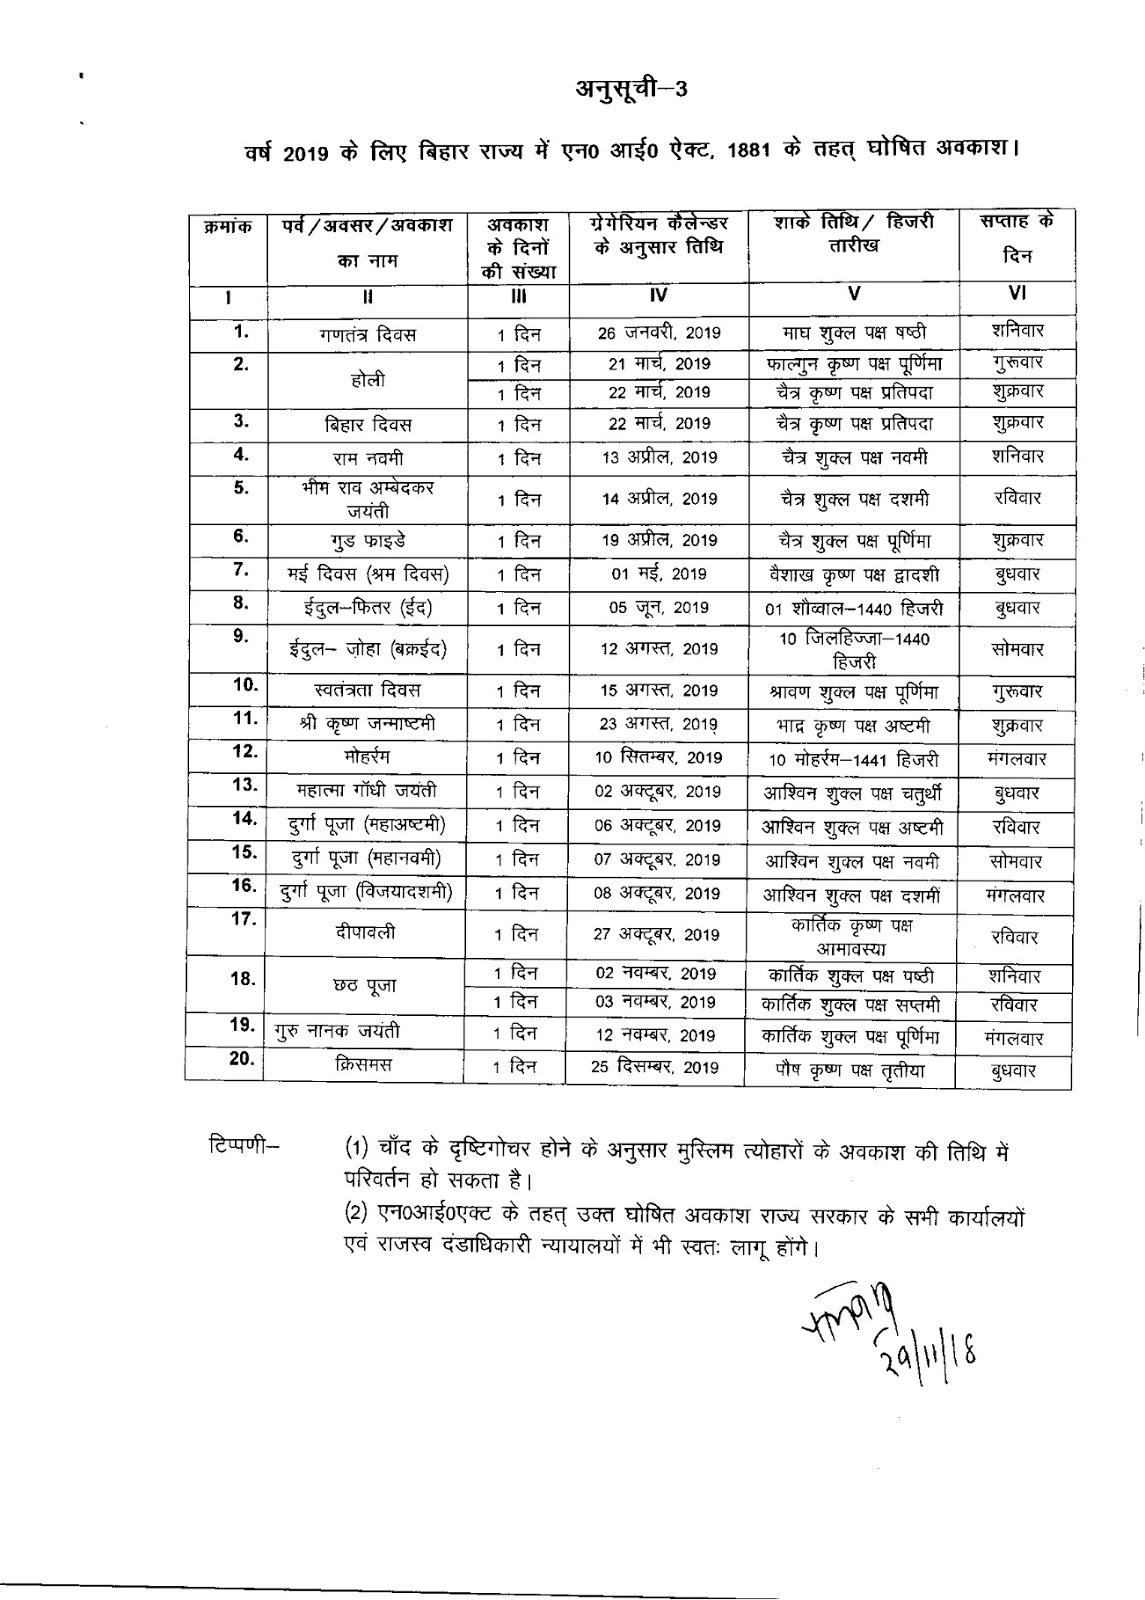 Bihar Government Calendar 2019 intended for Bihar Sarkar Calendra